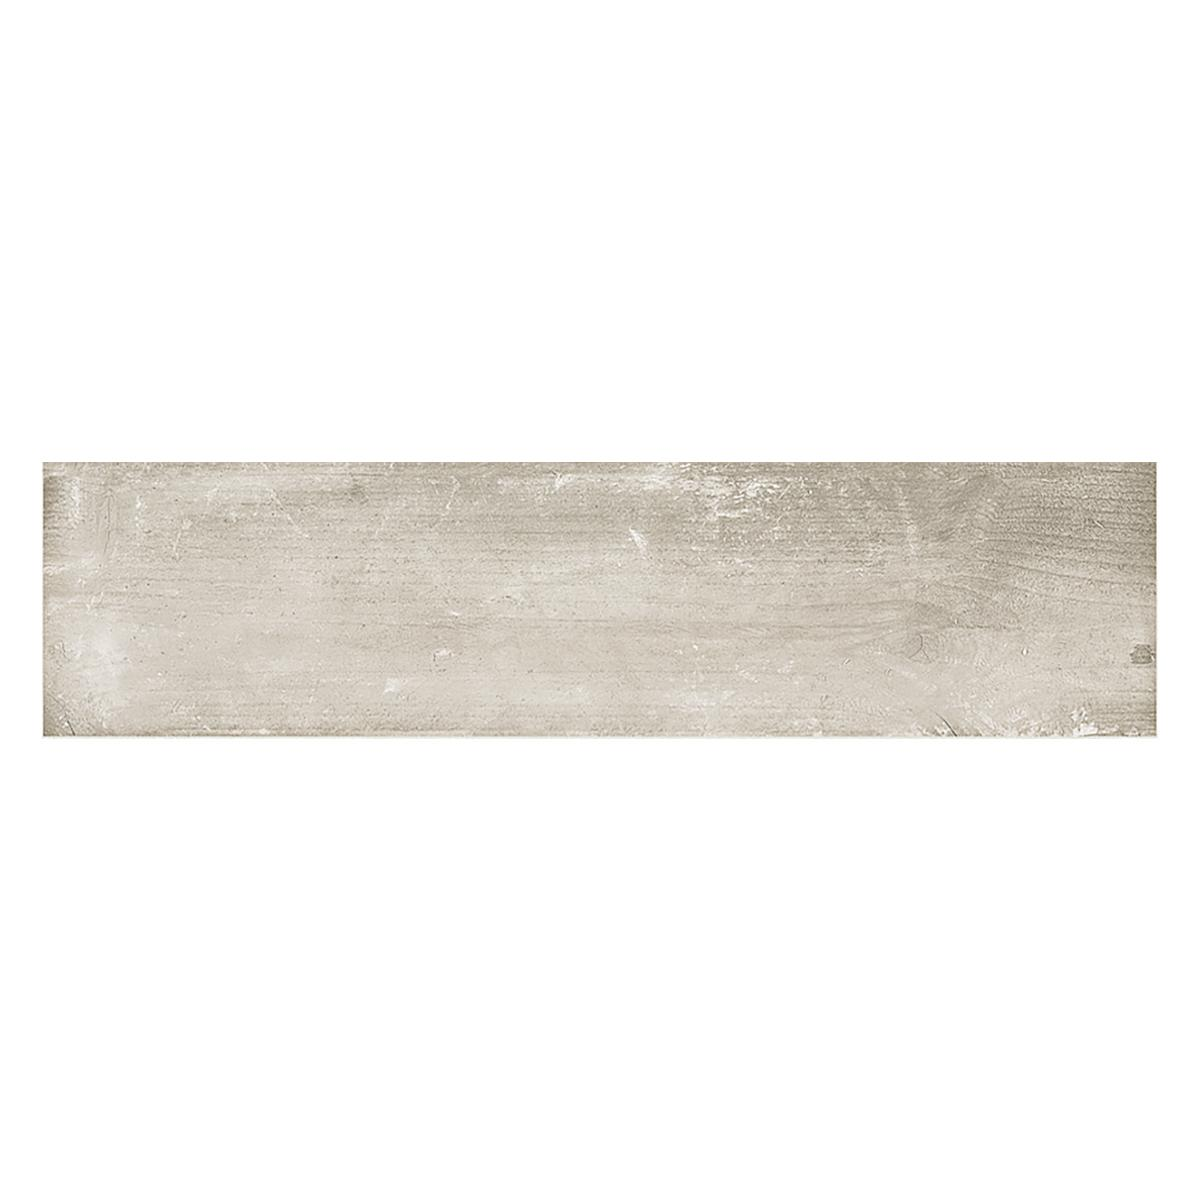 Porcelanato Riverside Blanco/Gris Mate - 15X60 cm - 1.26 m2